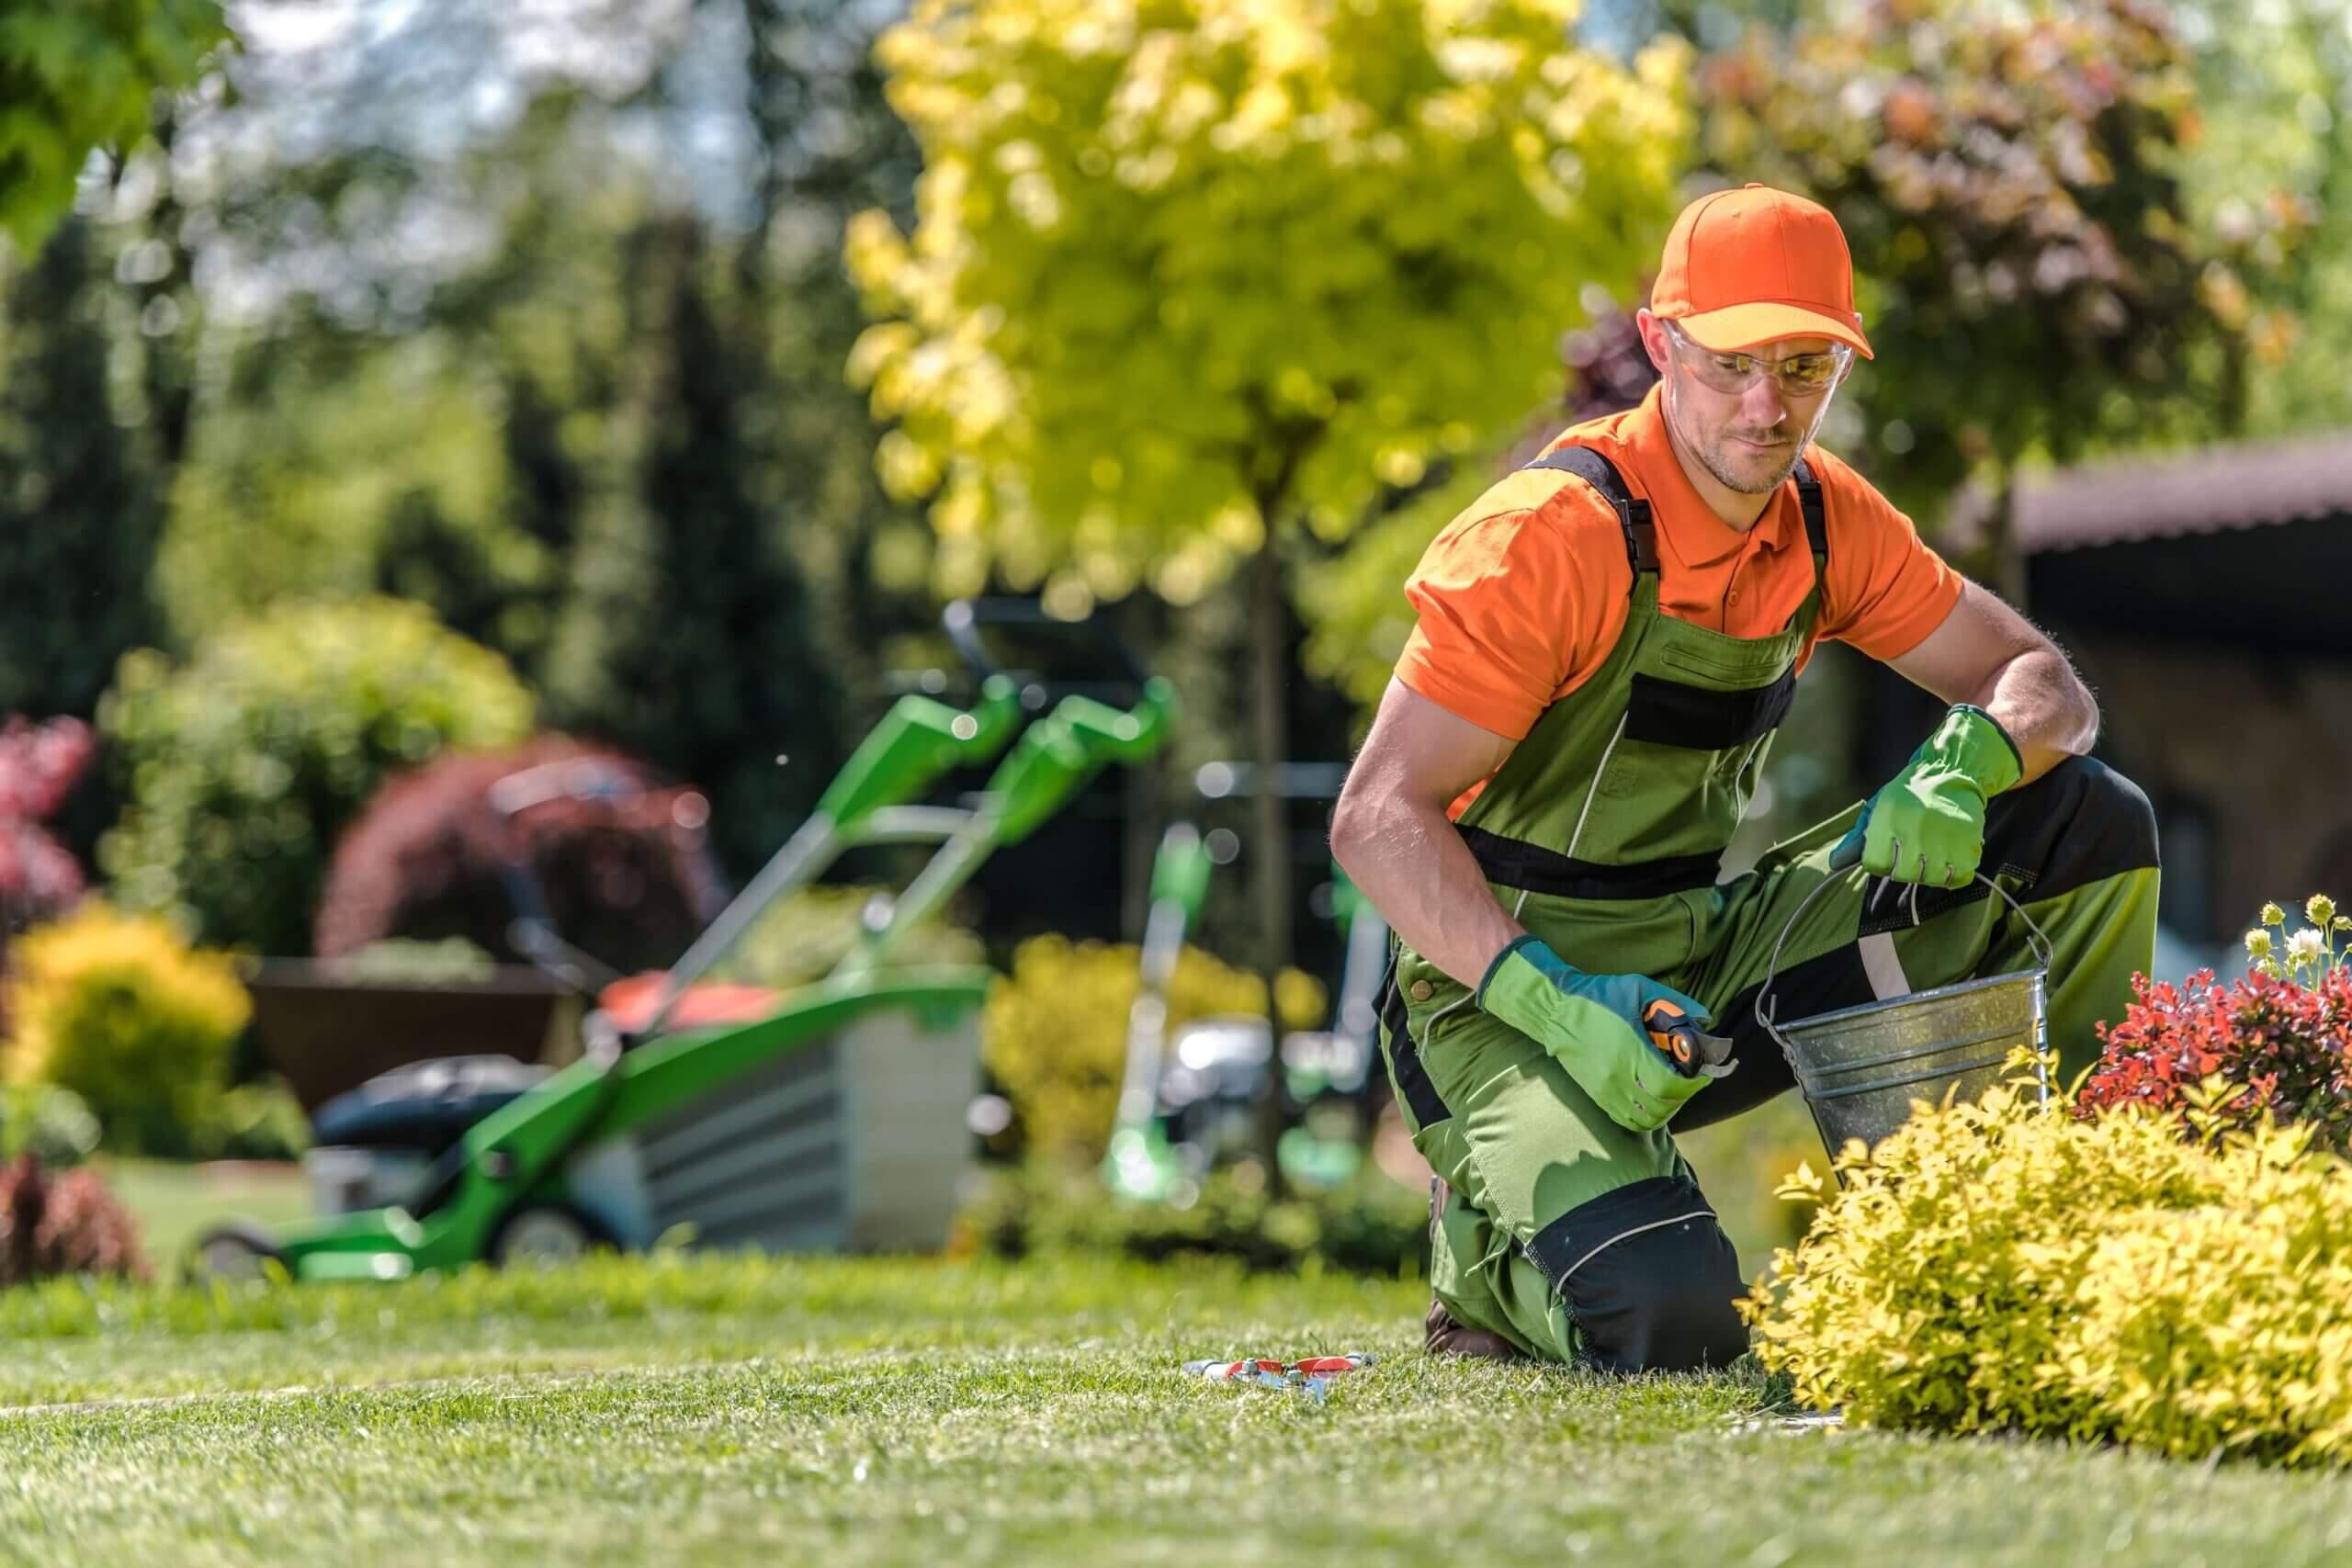 secheli Gartengestaltung Wien Gartenpflege  scaled